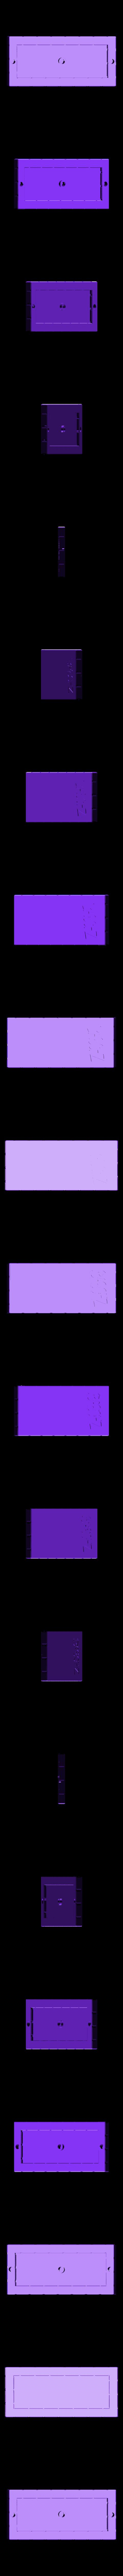 Fingerboard_Planter_BASE_-_design_contest_submission_Baschz_Leeft.stl Download free STL file Modular Fingerboard Ramp & Planter • Object to 3D print, baschz